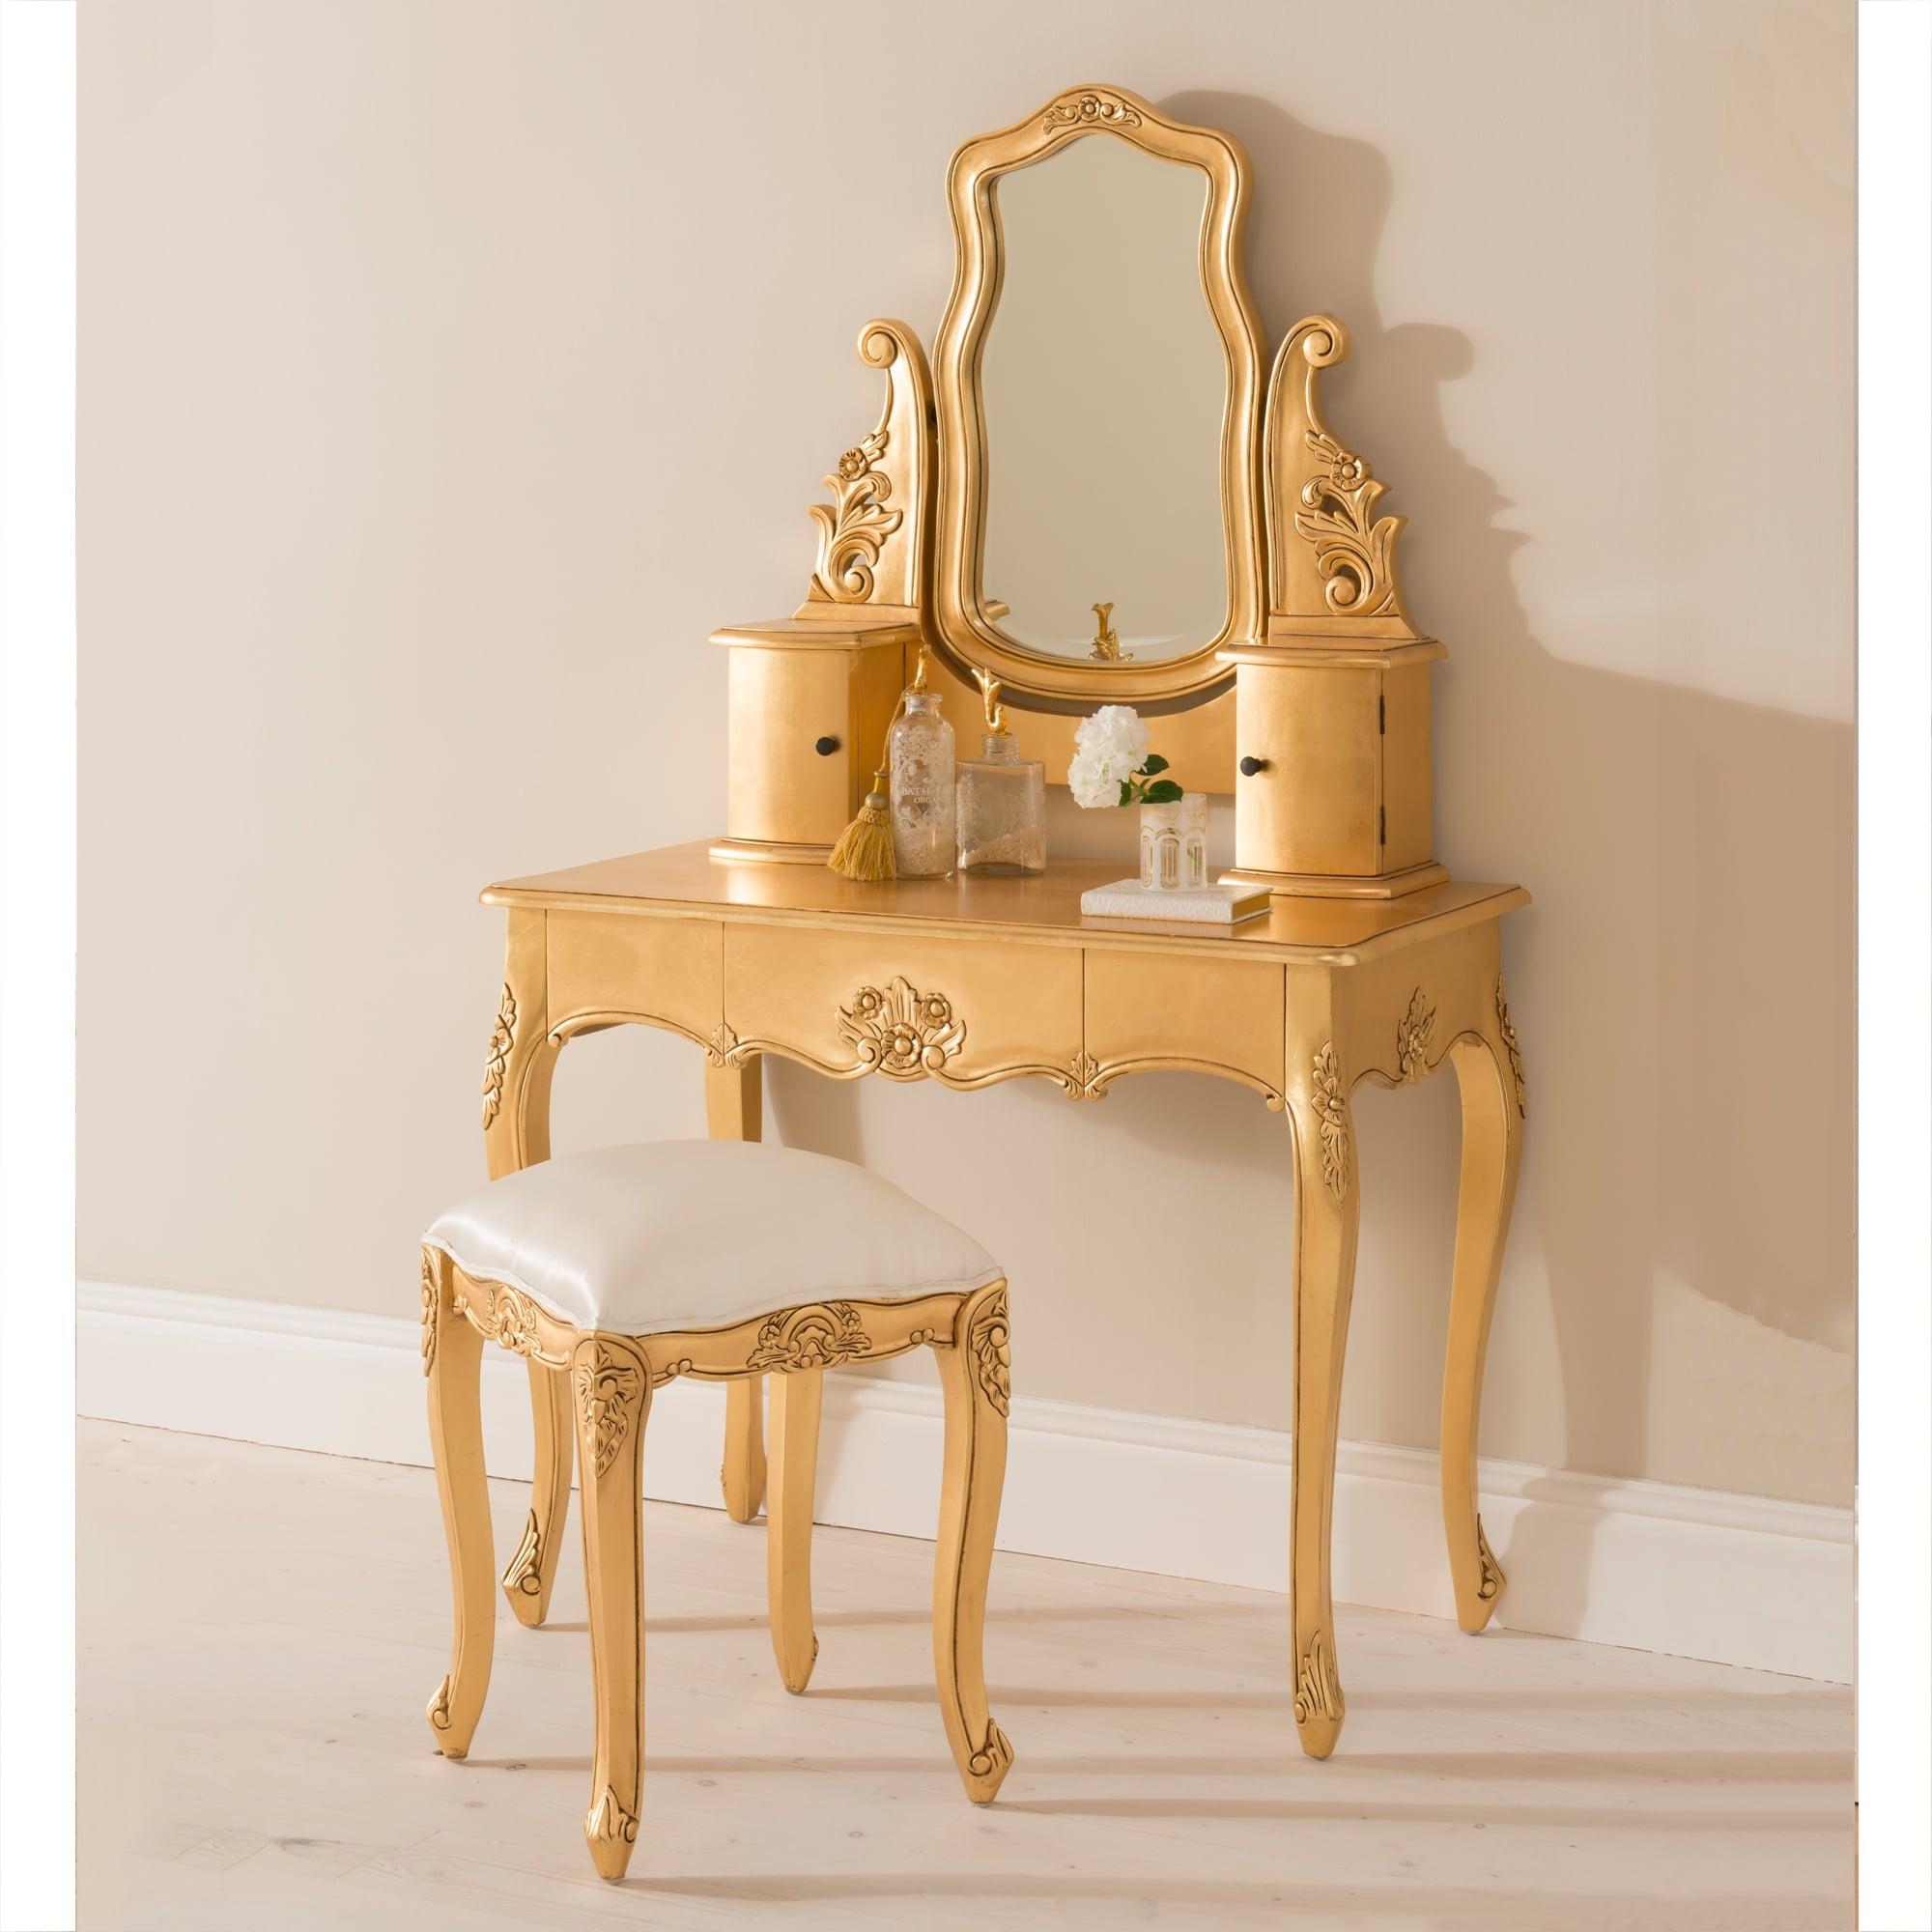 Baroque Gold Leaf Antique French Dressing Table Set